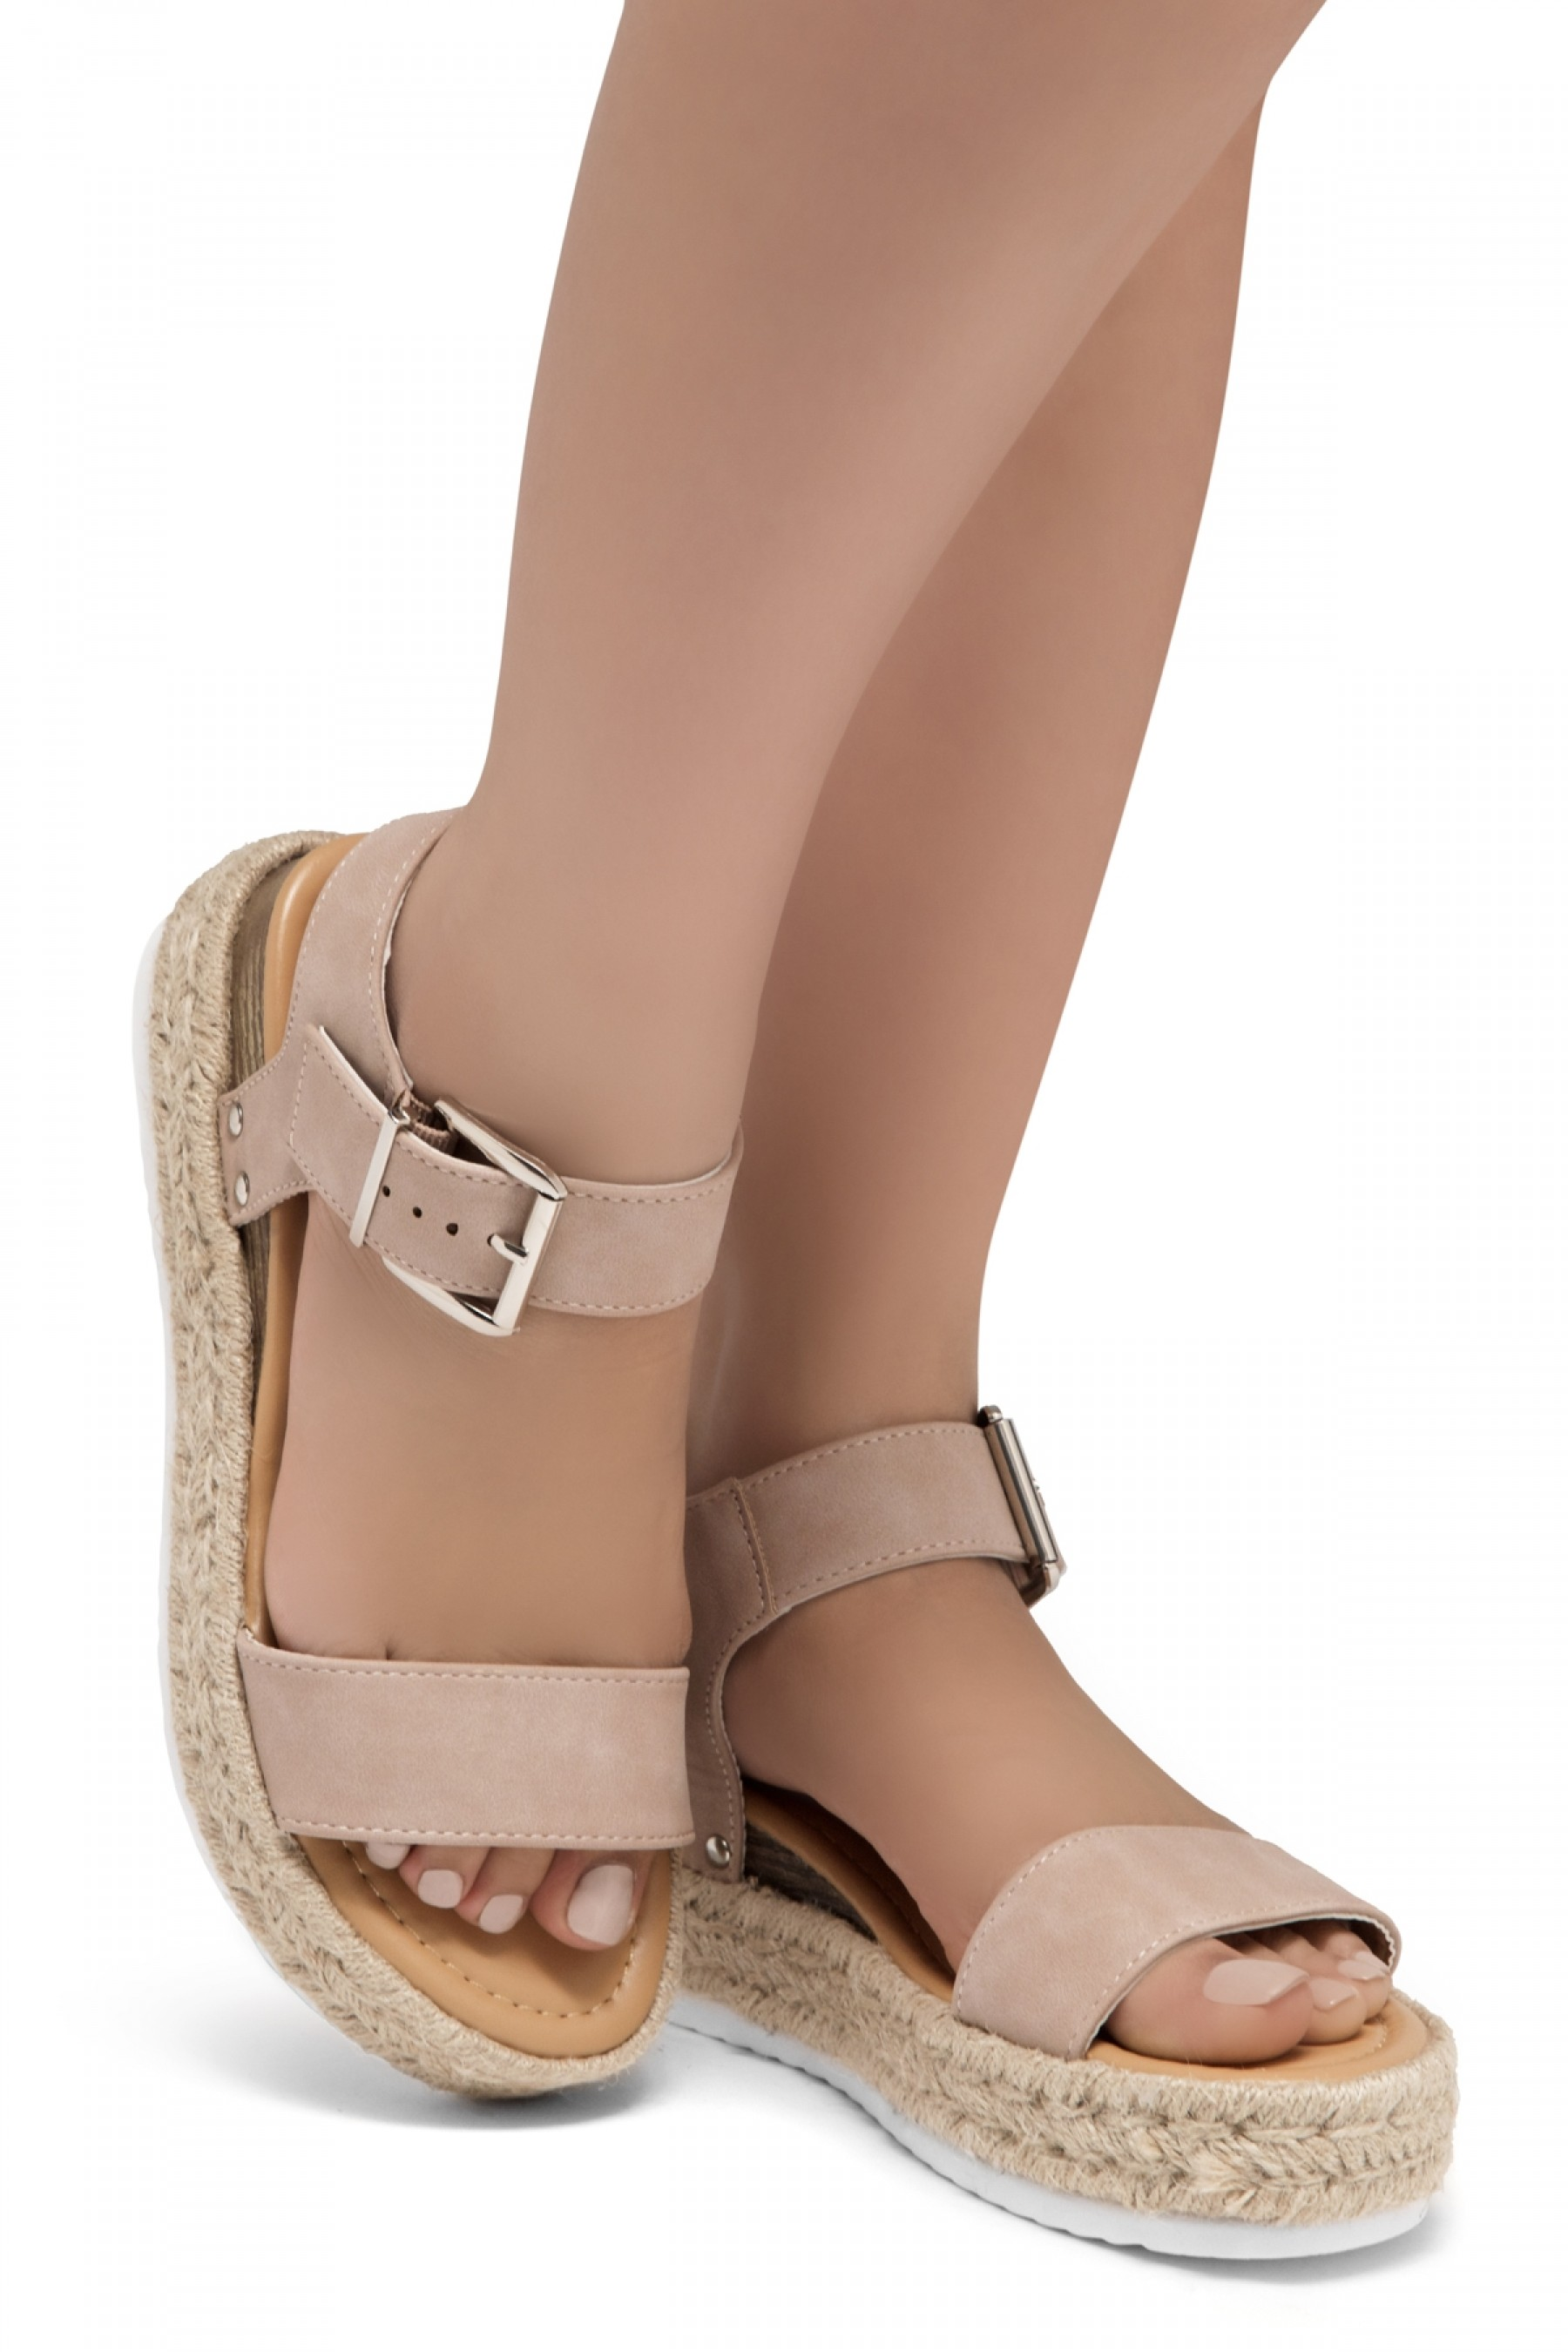 ShoeLand Alysa Womens Open Toe Ankle Strap Platform Wedge Sandals(Mauve)